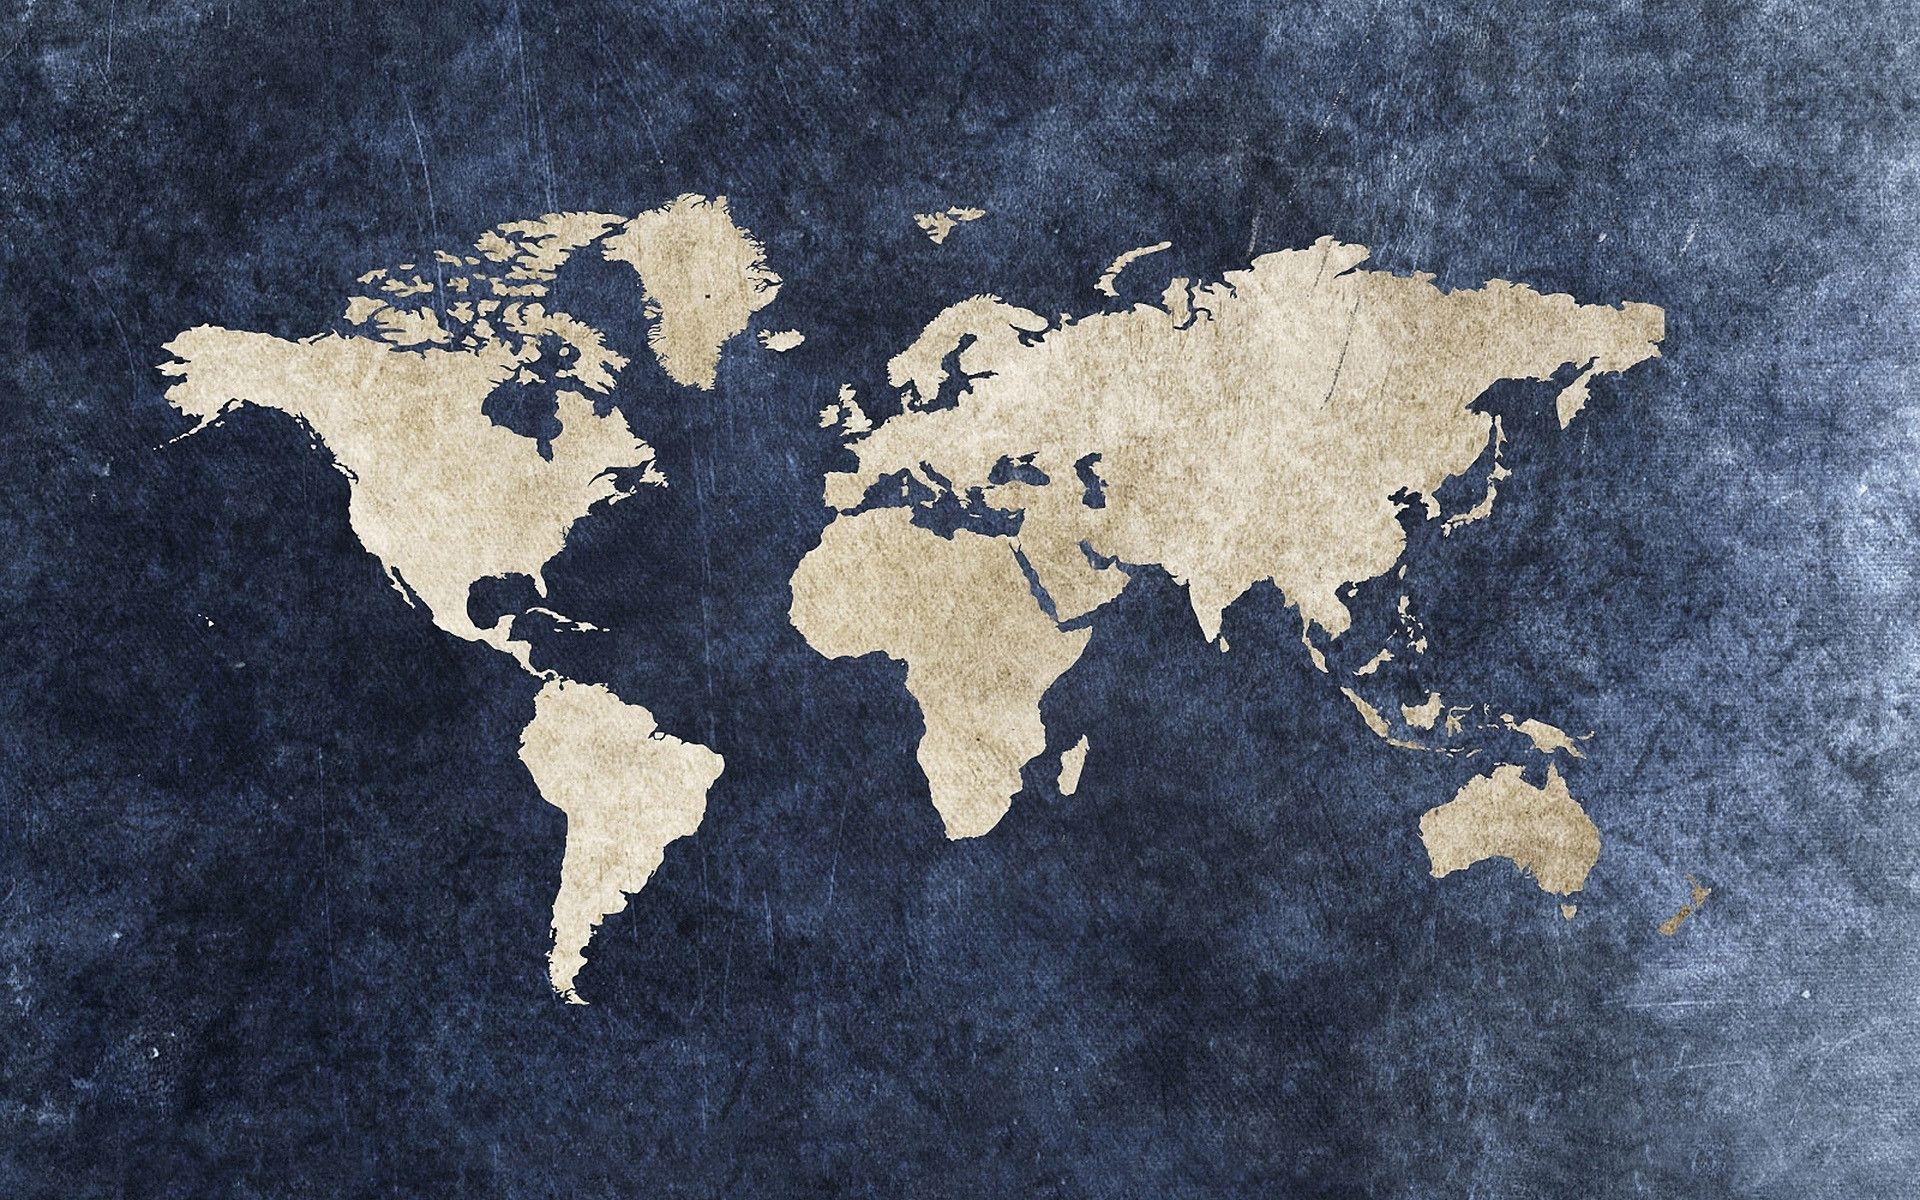 world map wallpapers - full hd wallpaper search | world traveler